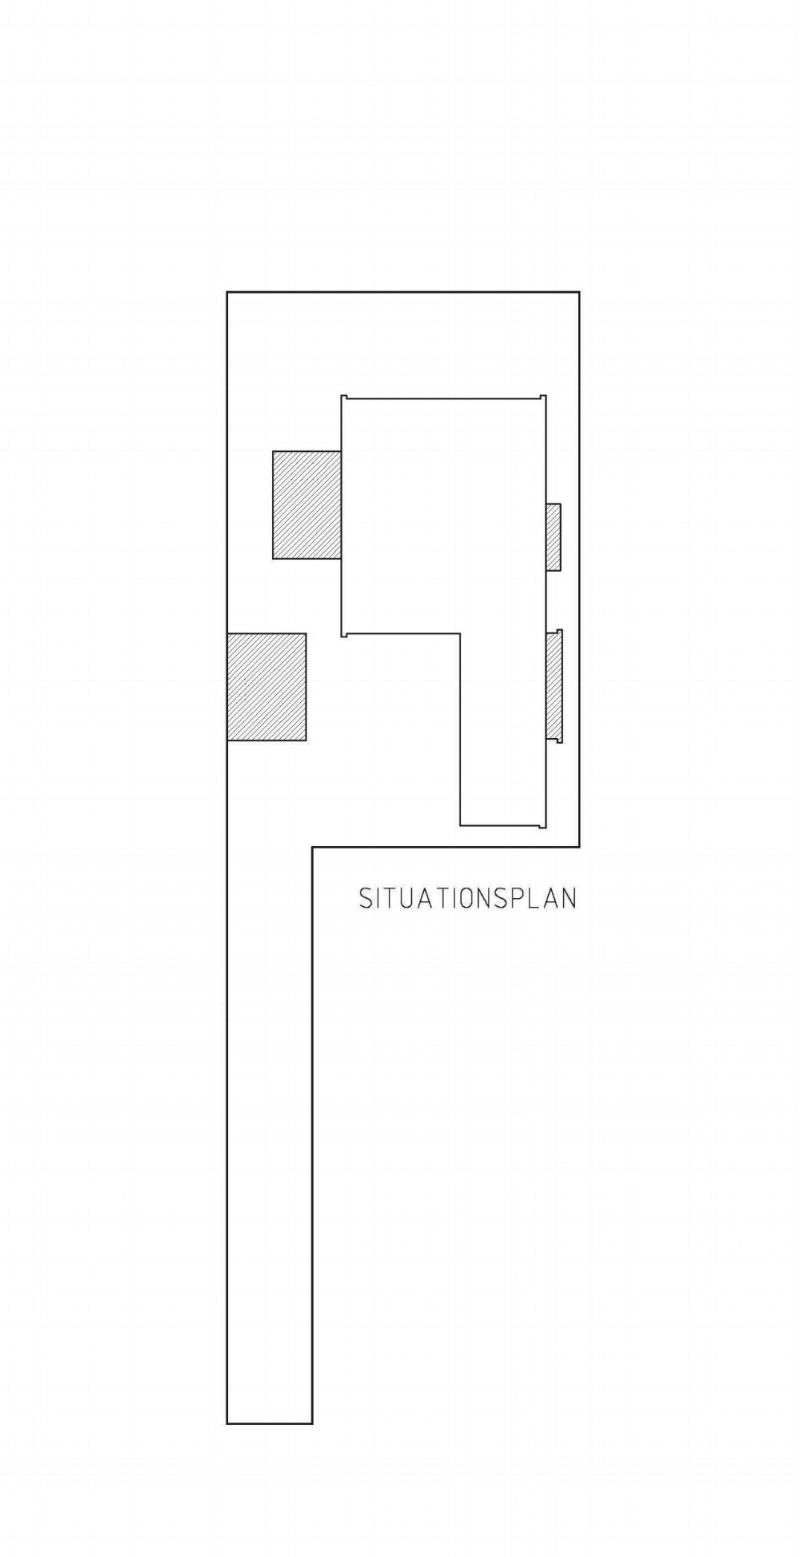 sitplan.jpg